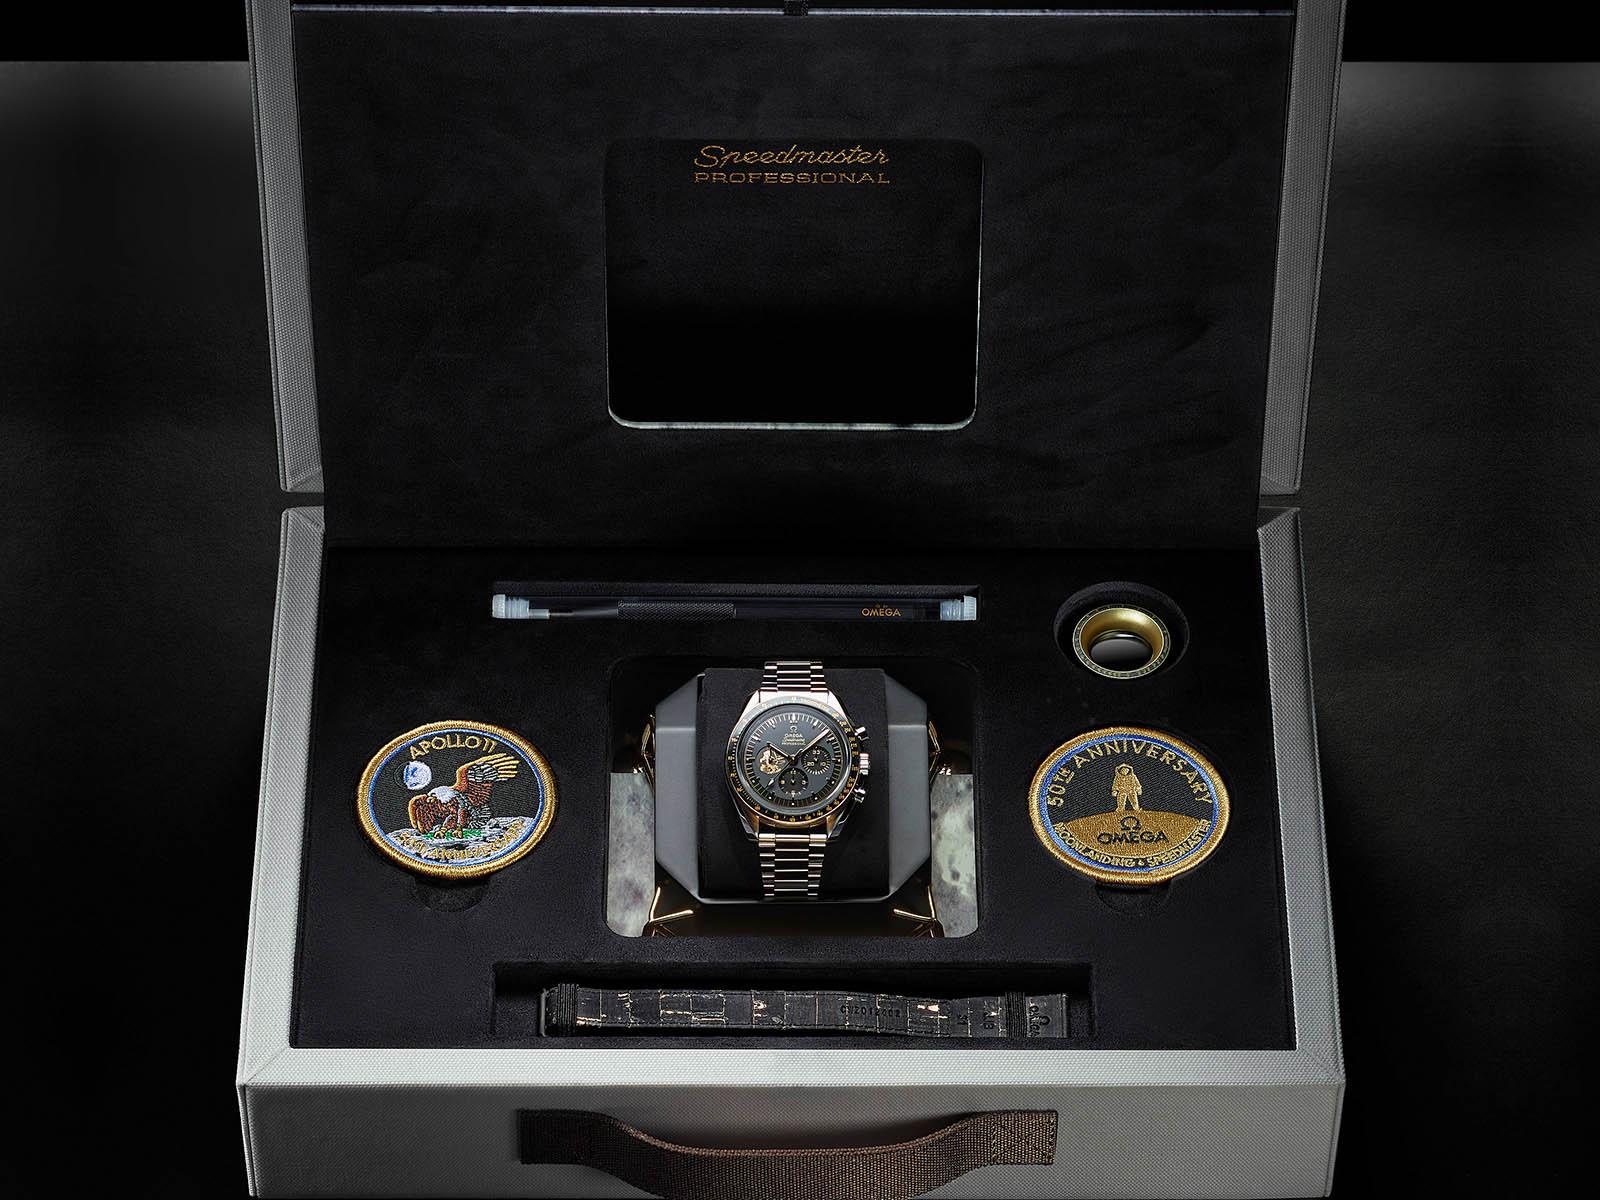 310-20-42-50-01-001-omega-speedmaster-apollo-11-50th-anniversary-limited-edition-8.jpg